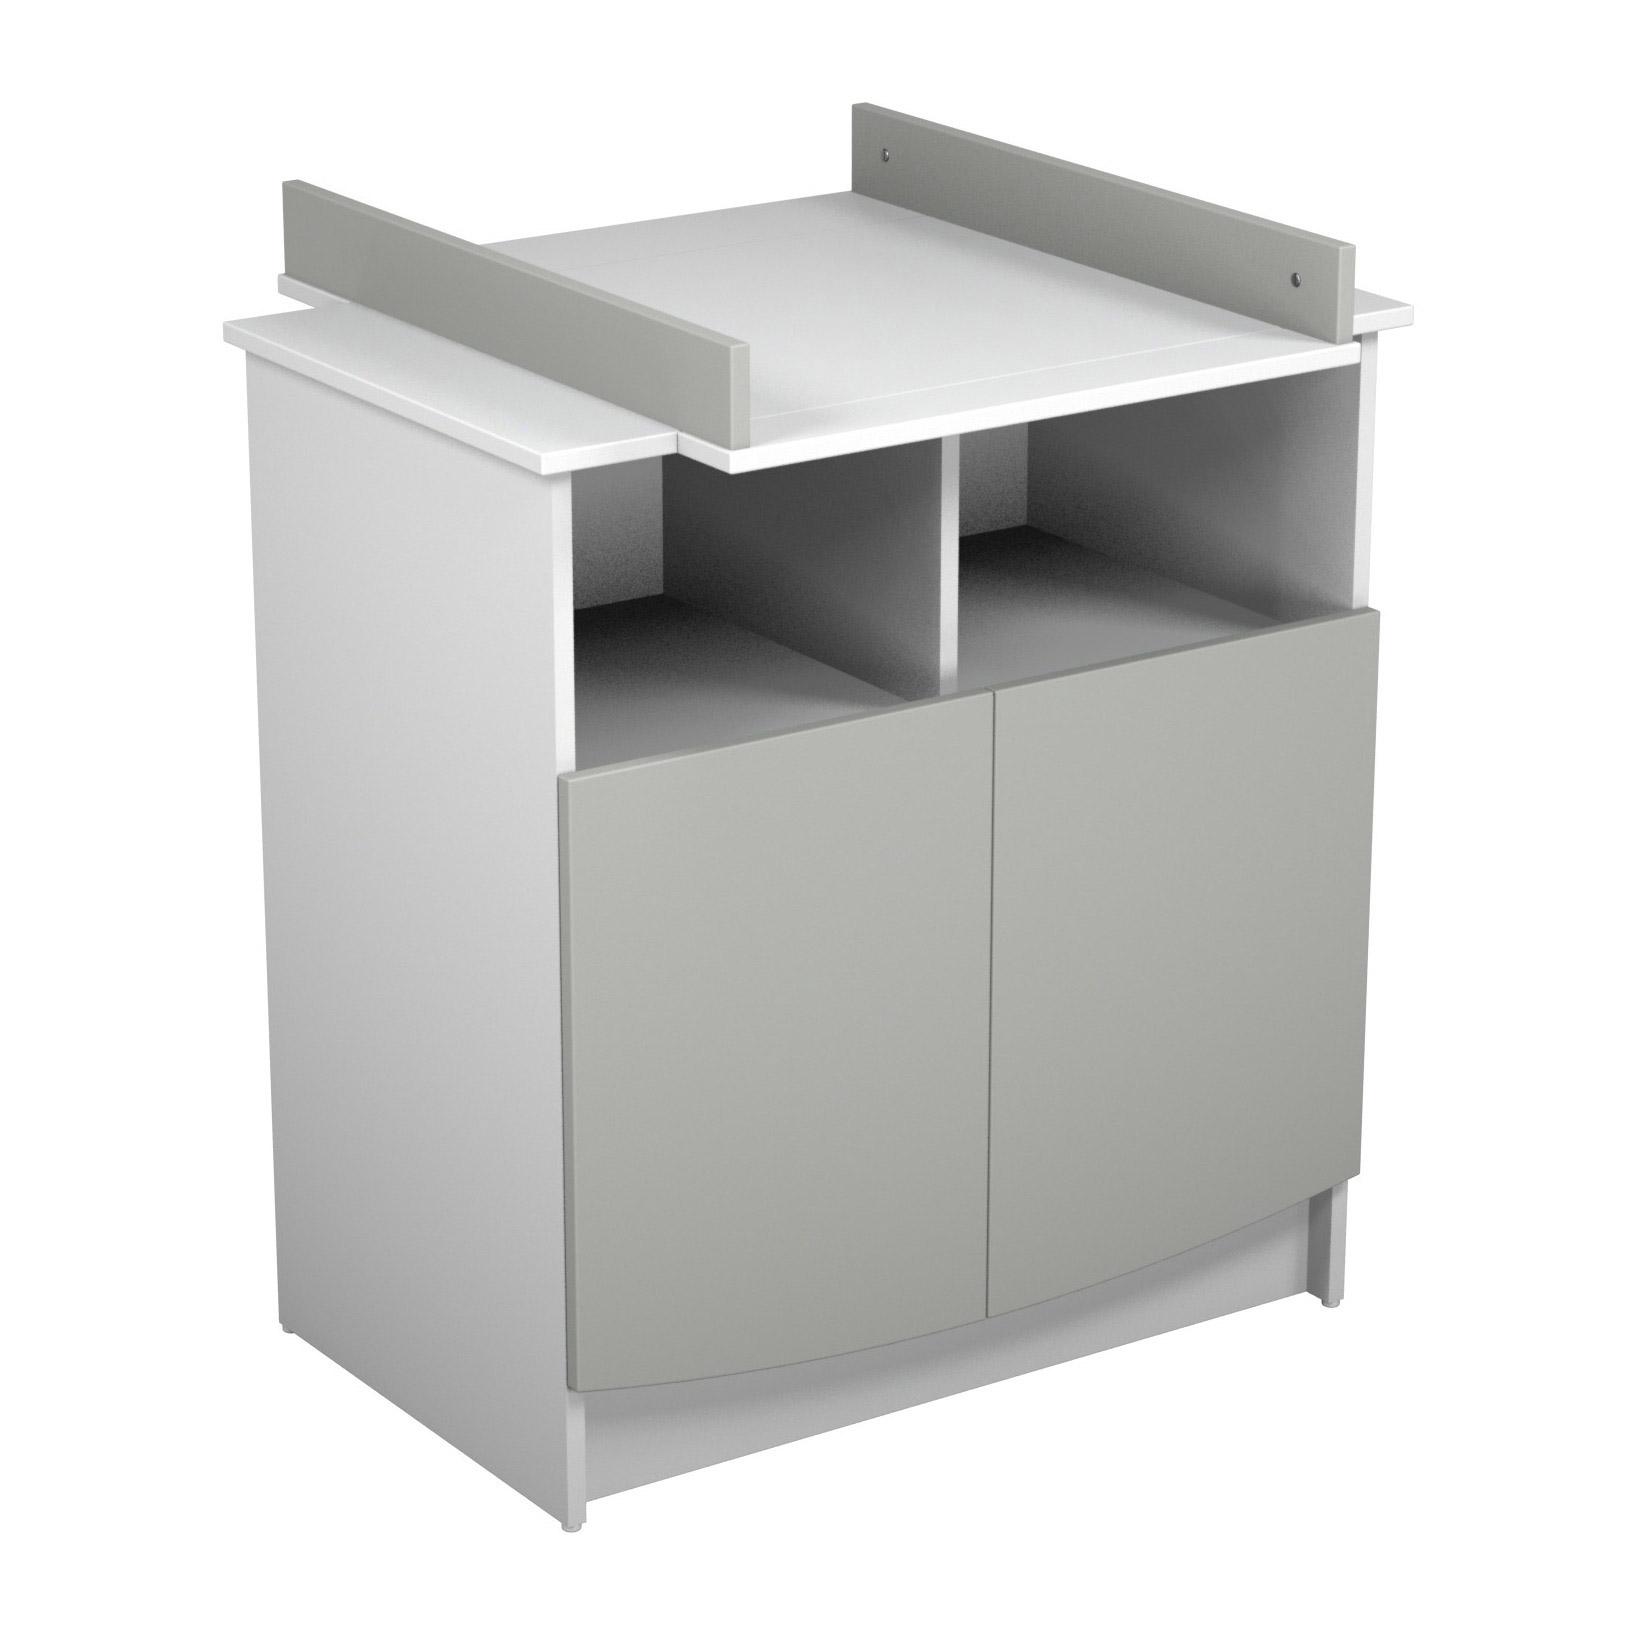 Primo Duo commode 2 portes Gris / Blanc  de Jurababy